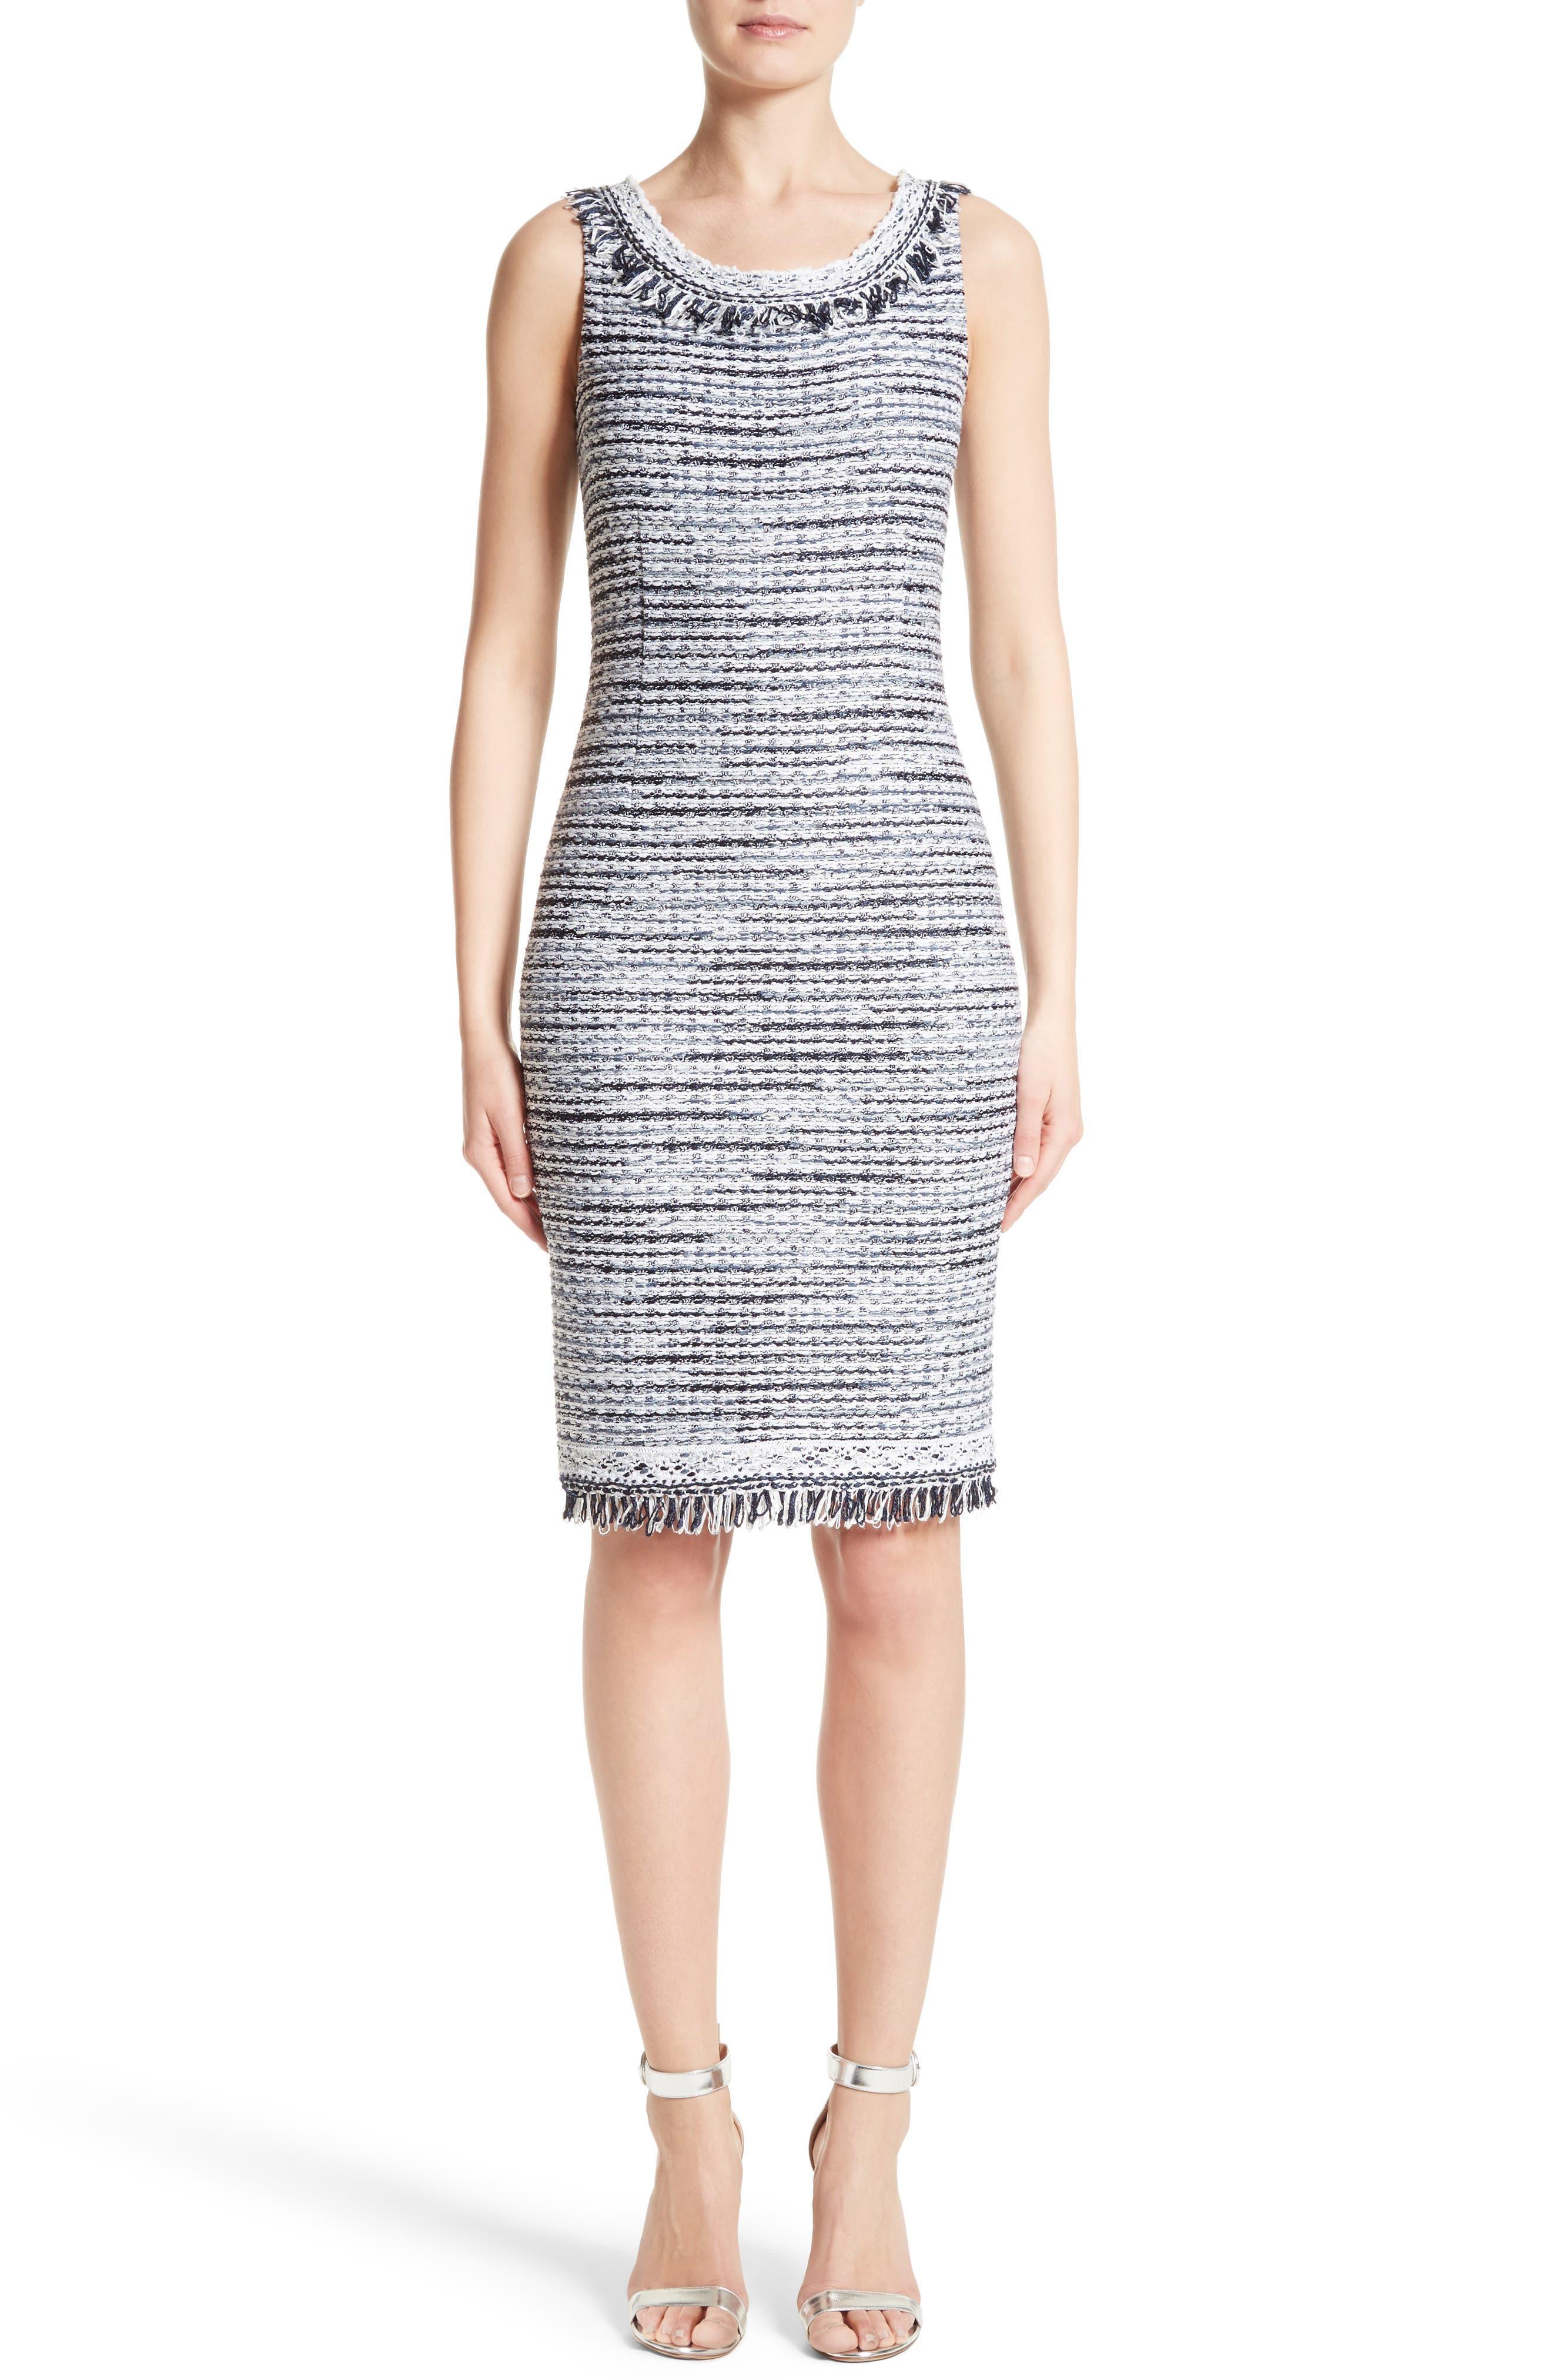 S. John Collection Tanya Knit Pencil Dress,                         Main,                         color, Bianco/ Navy Multi